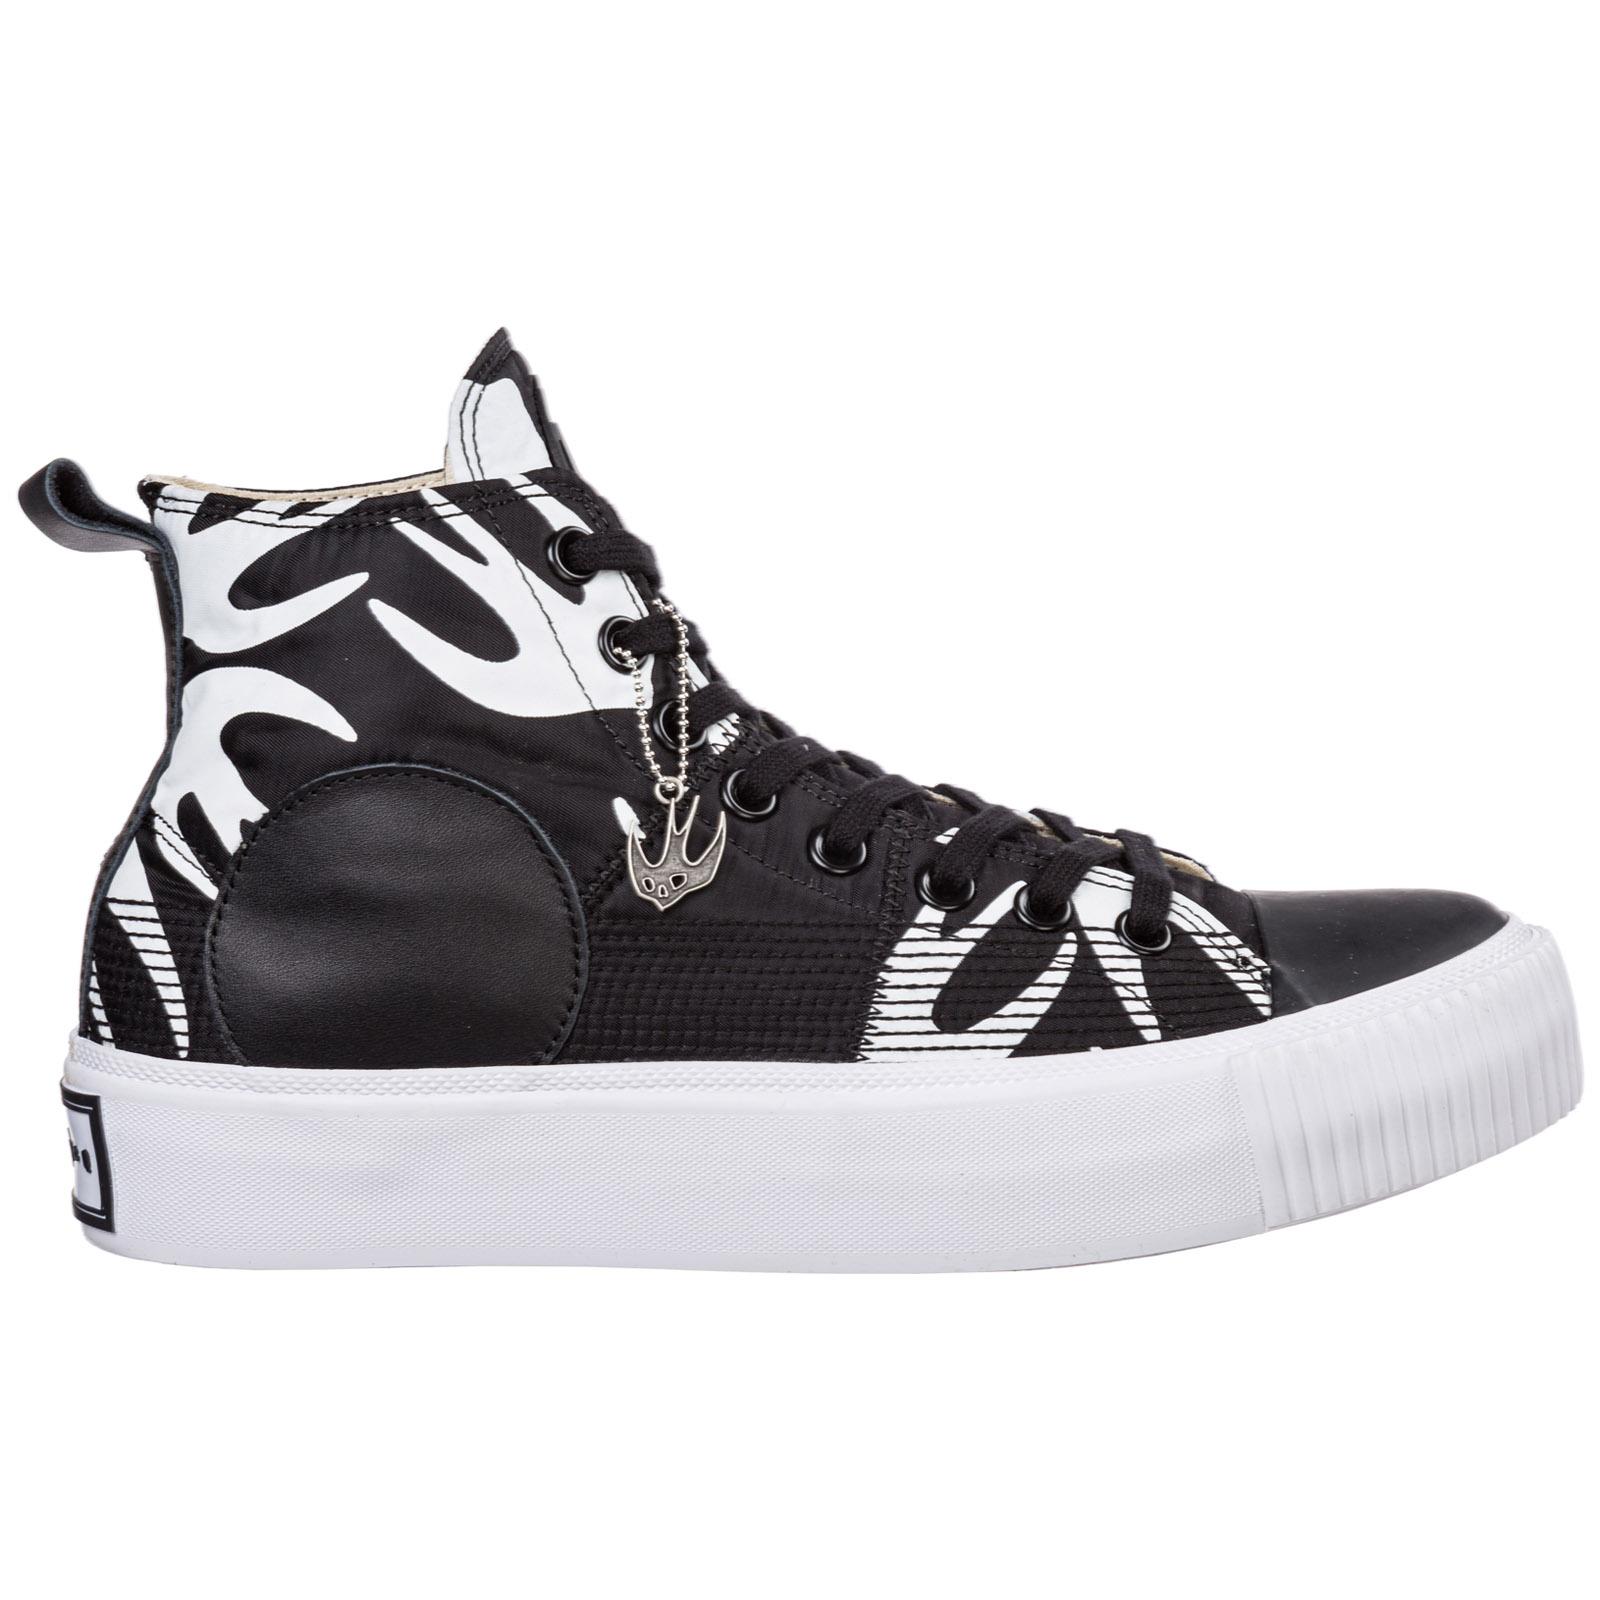 Scarpe sneakers alte uomo plimsoll platform